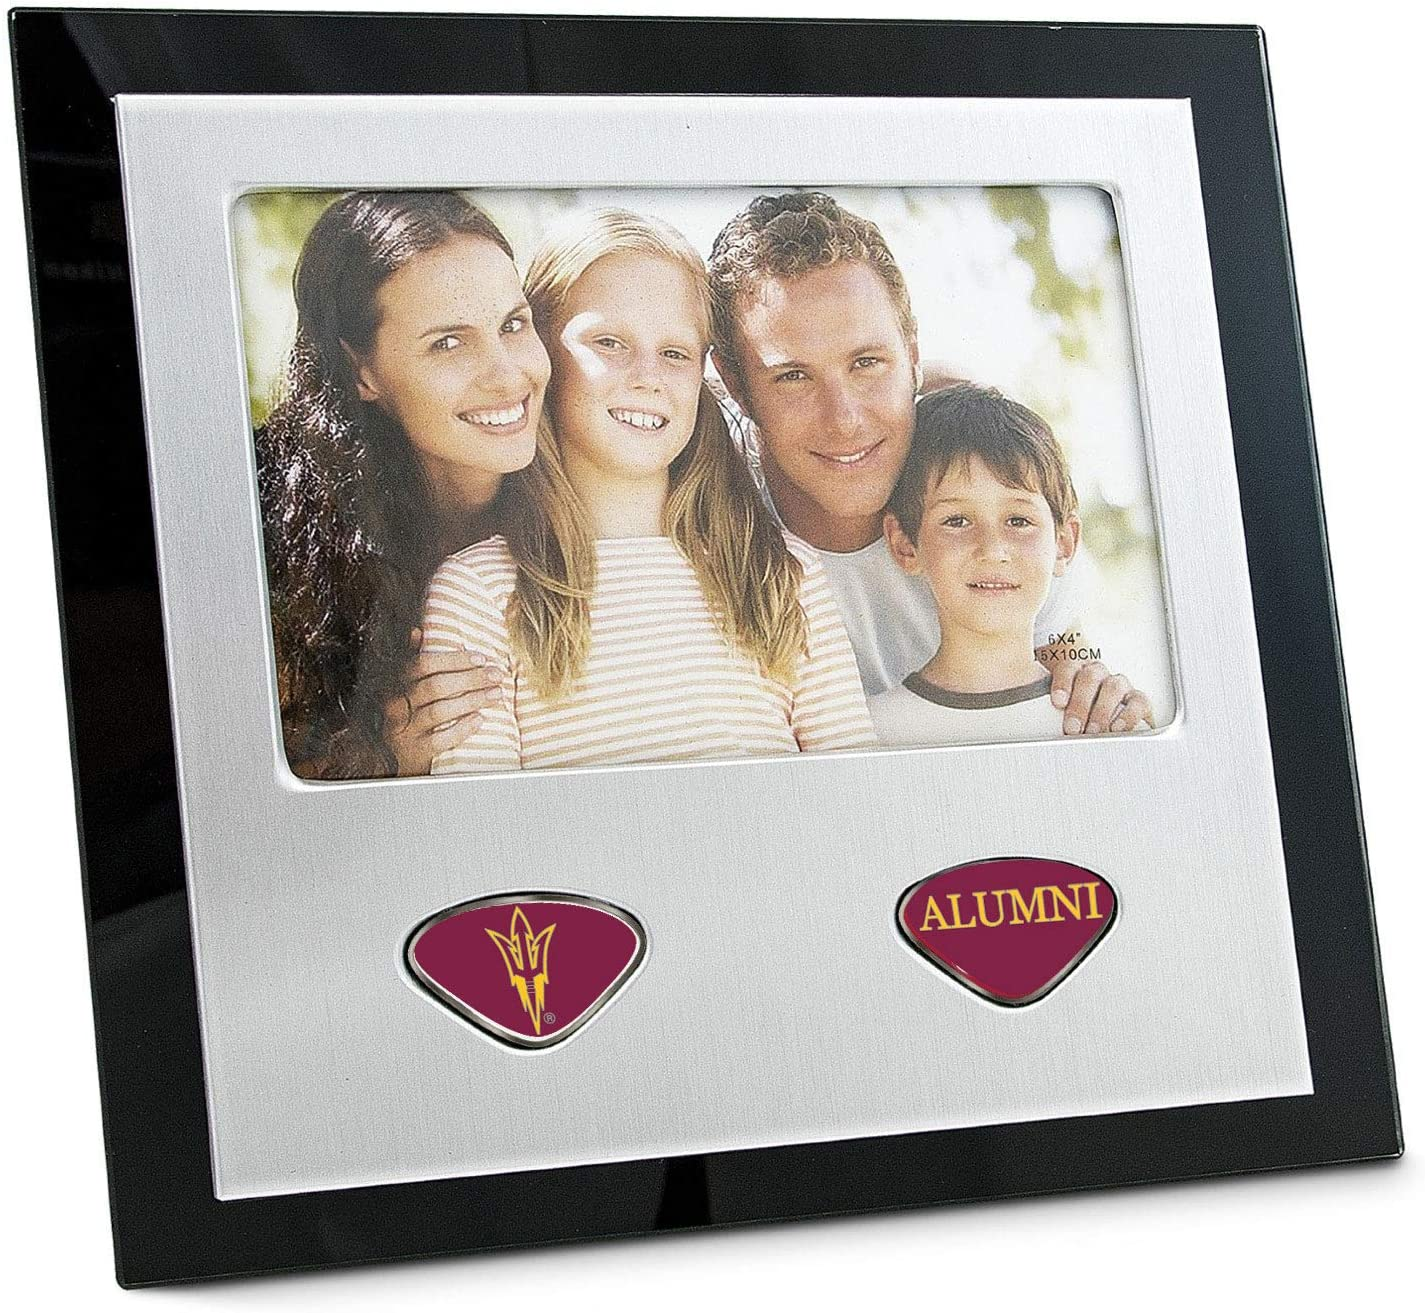 One Size Silver AdSpec NCAA Arizona State Sun Devils Collegiate Photo FrameCollegiate Photo Frame